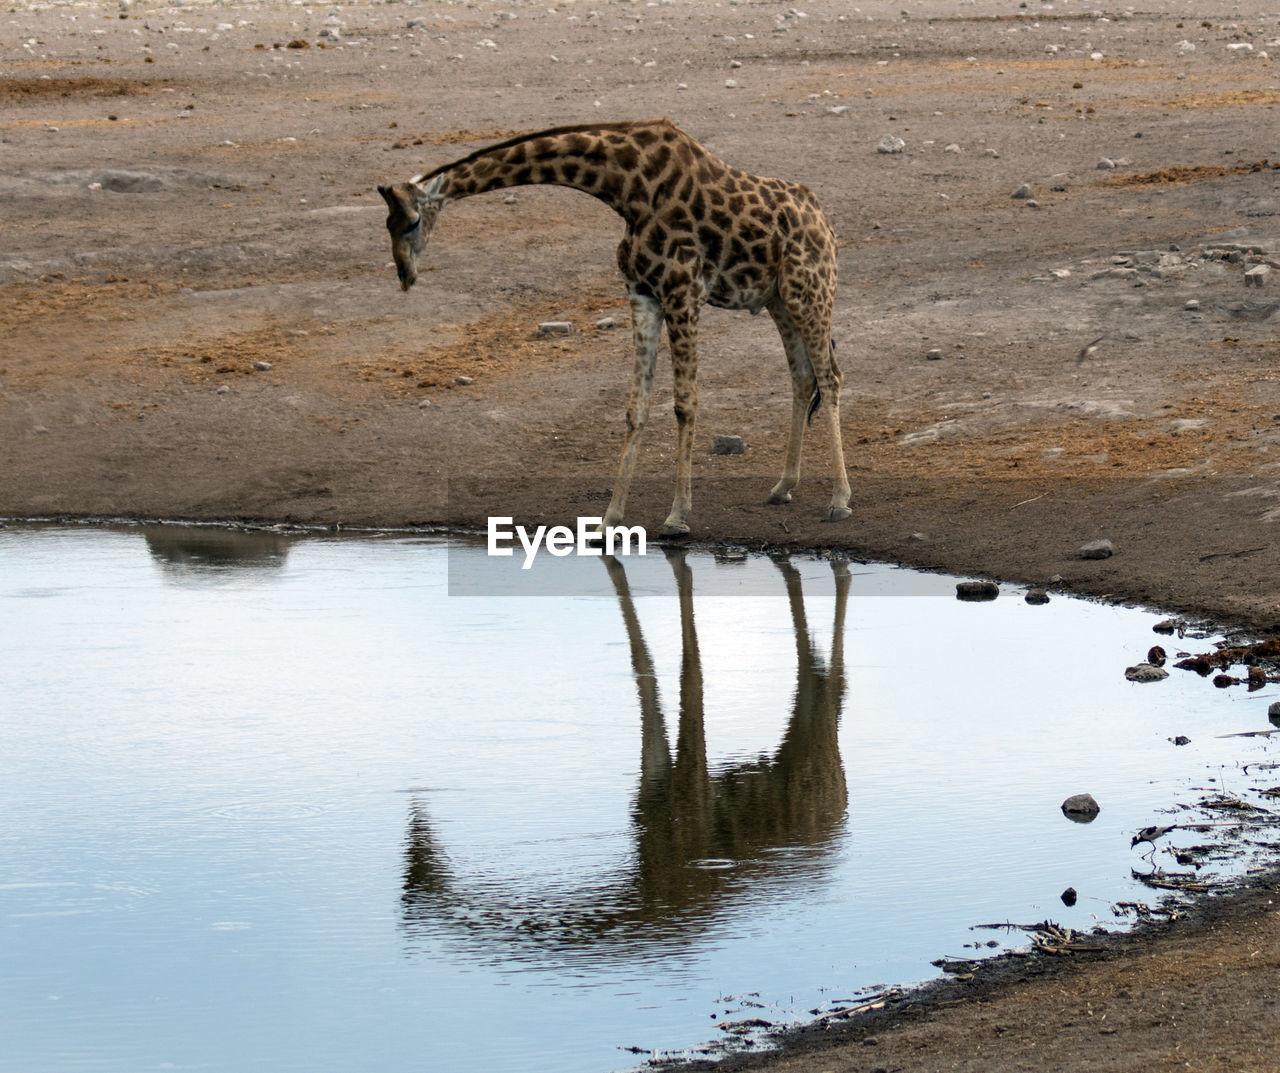 animal themes, animal, water, animal wildlife, one animal, reflection, animals in the wild, mammal, nature, drinking, no people, giraffe, drink, lake, day, safari, vertebrate, waterfront